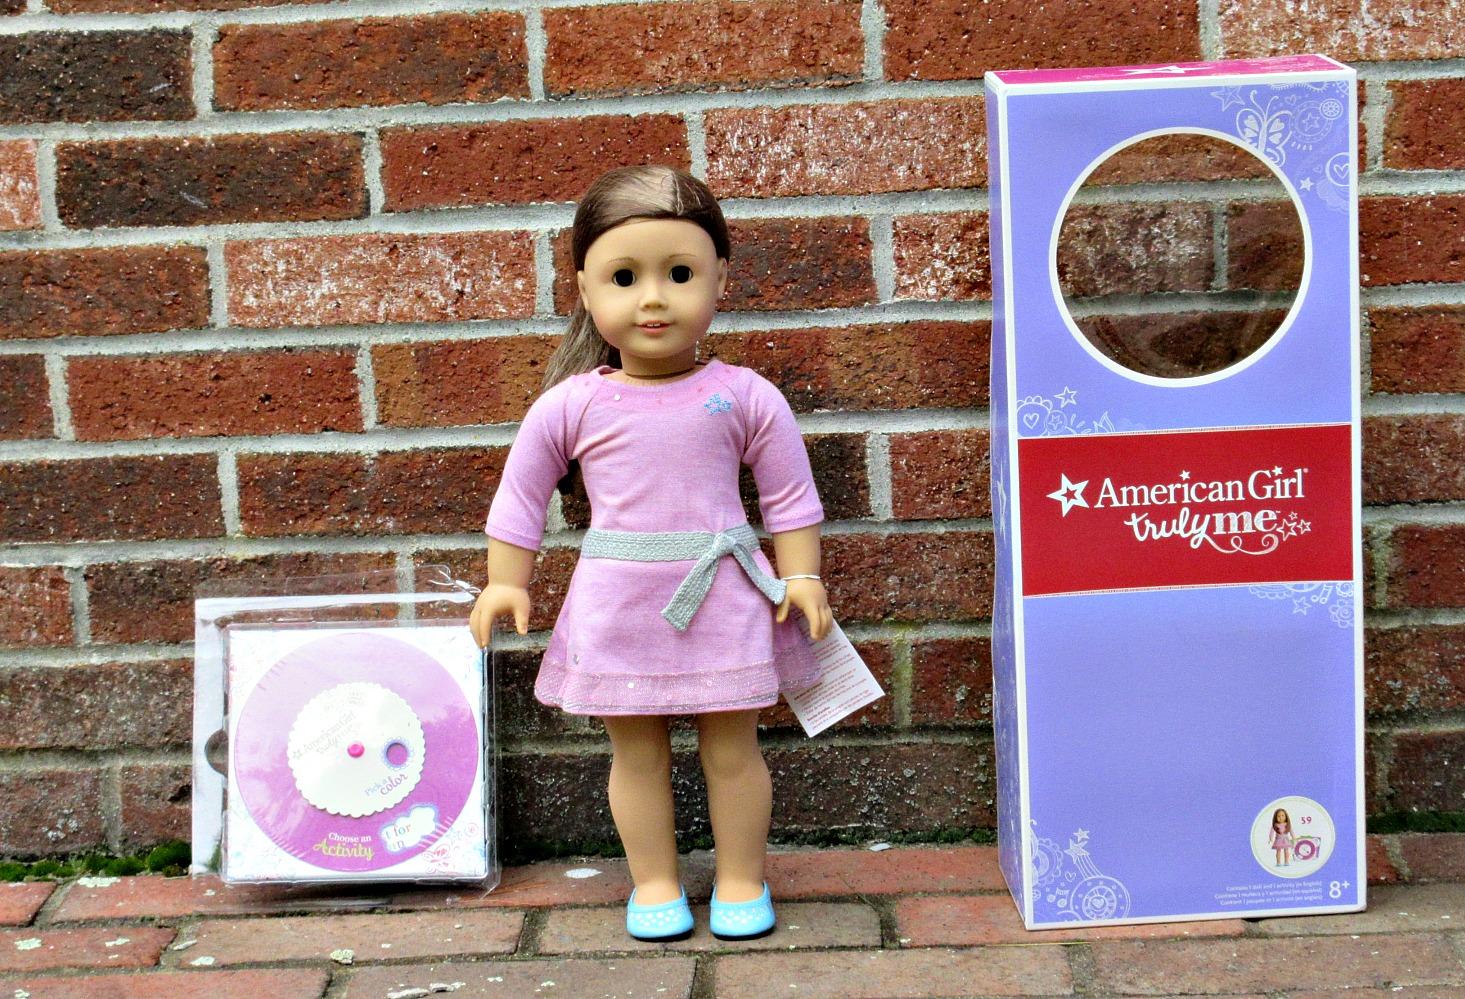 American Girl doll #59.jpg